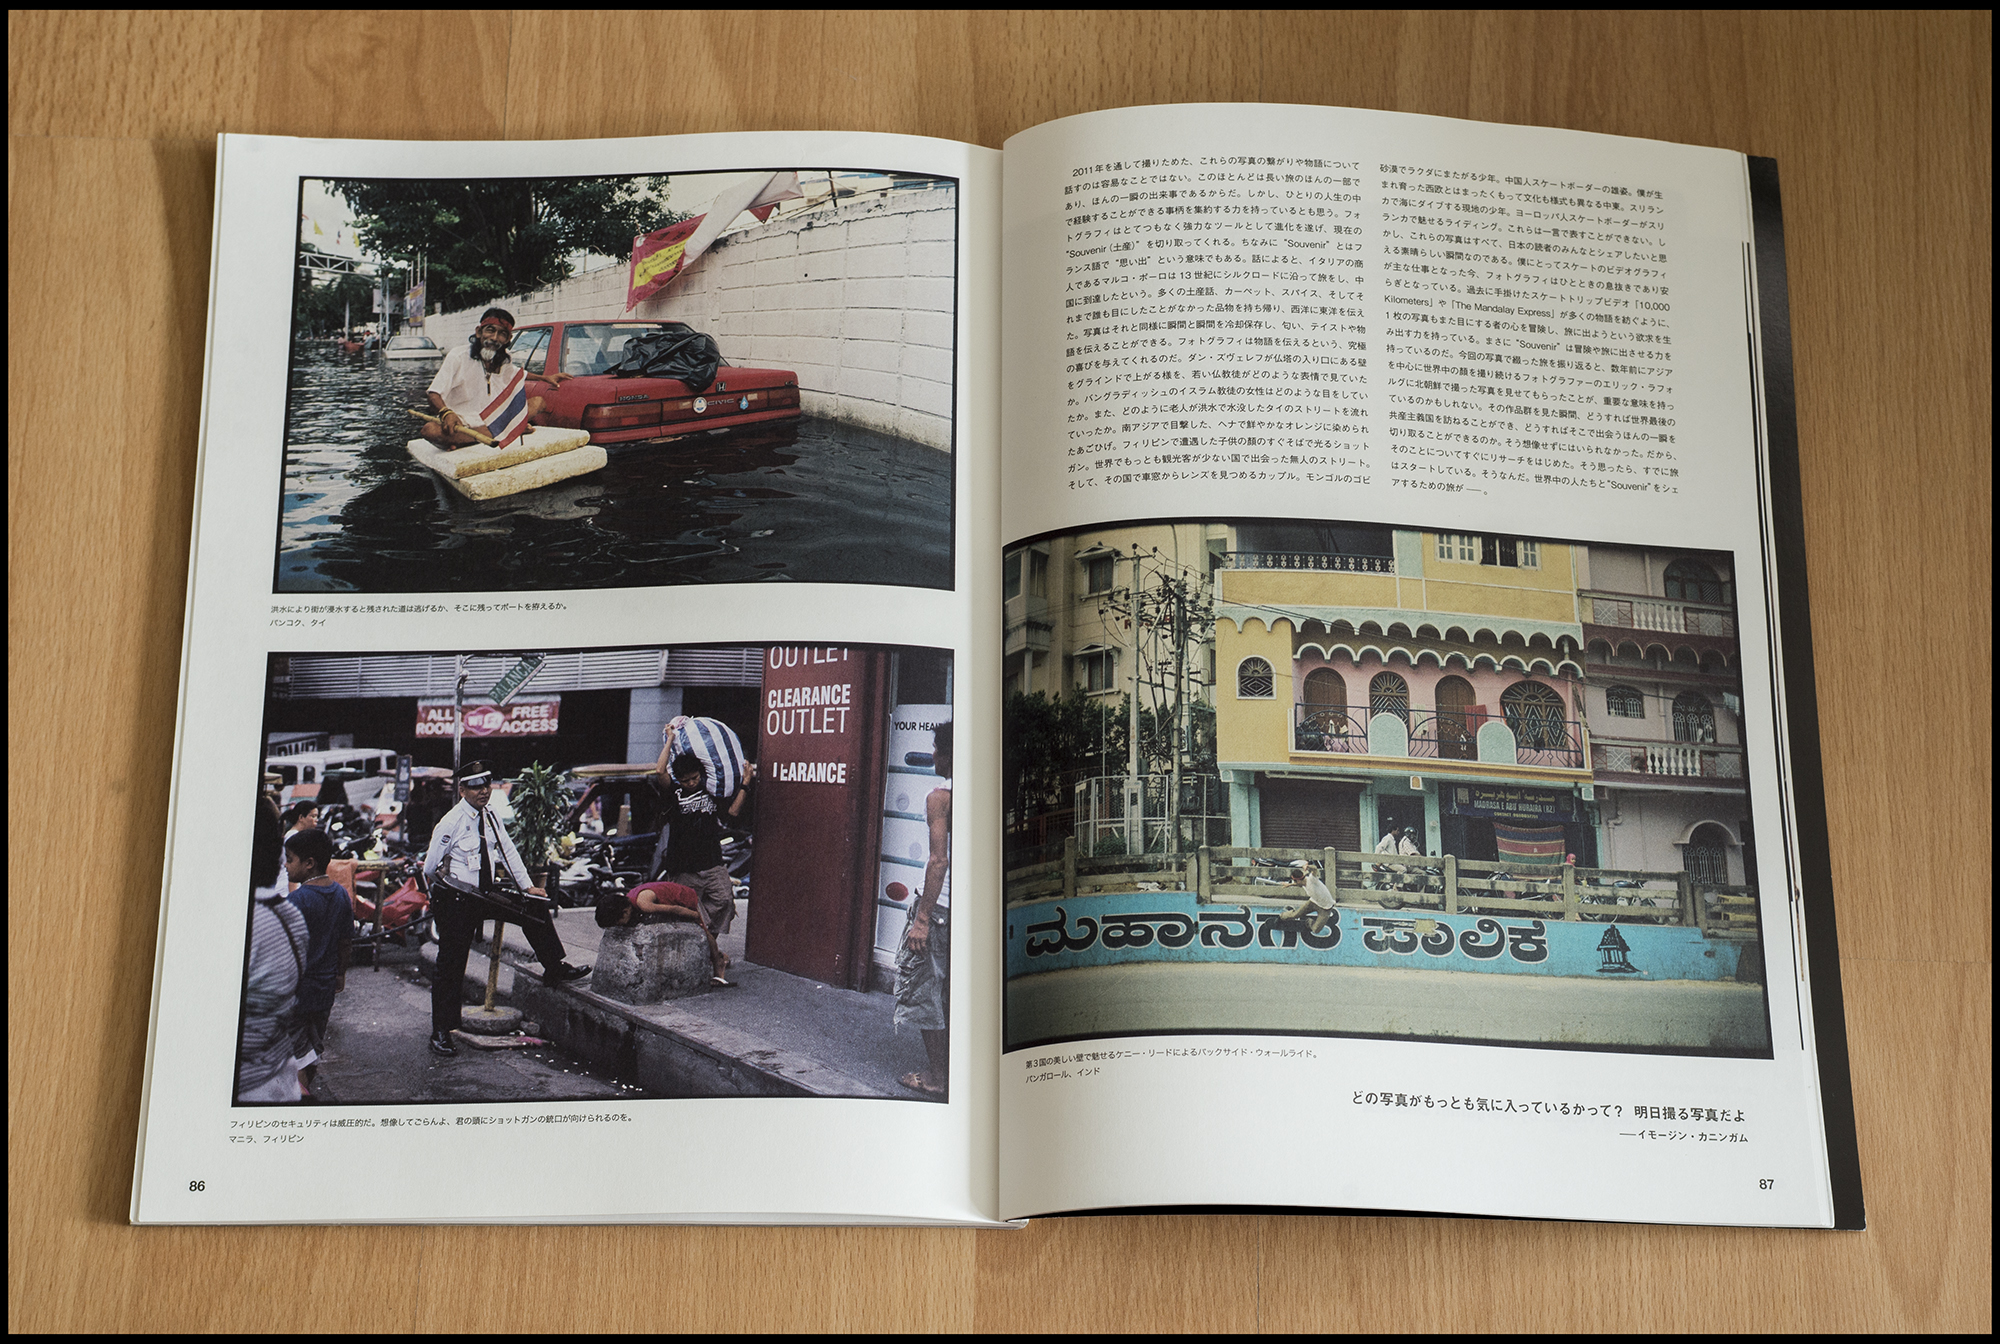 Magazines SB Japan 2012 Page 02 LOWQ 2000P